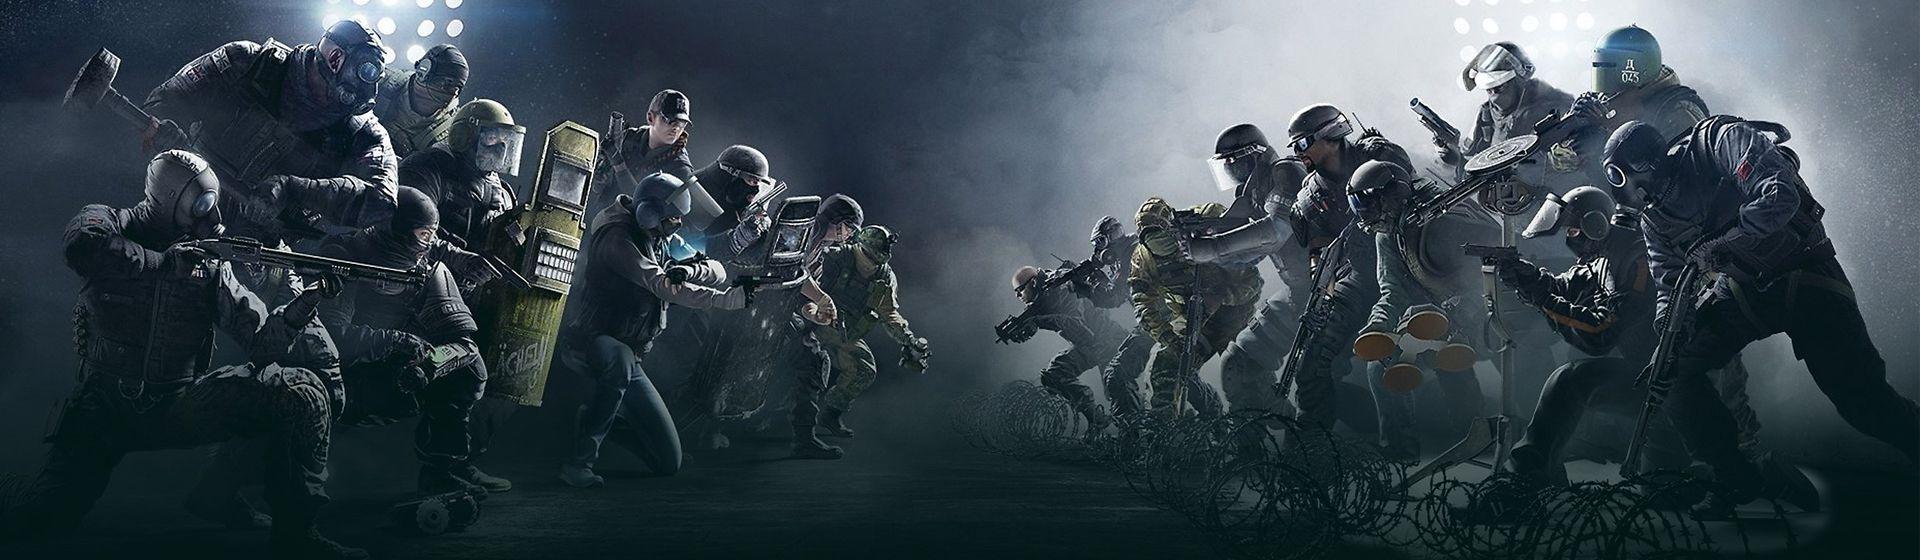 NVIDIA dá Rainbow Six Siege na compra de placas de vídeo GeForce RTX